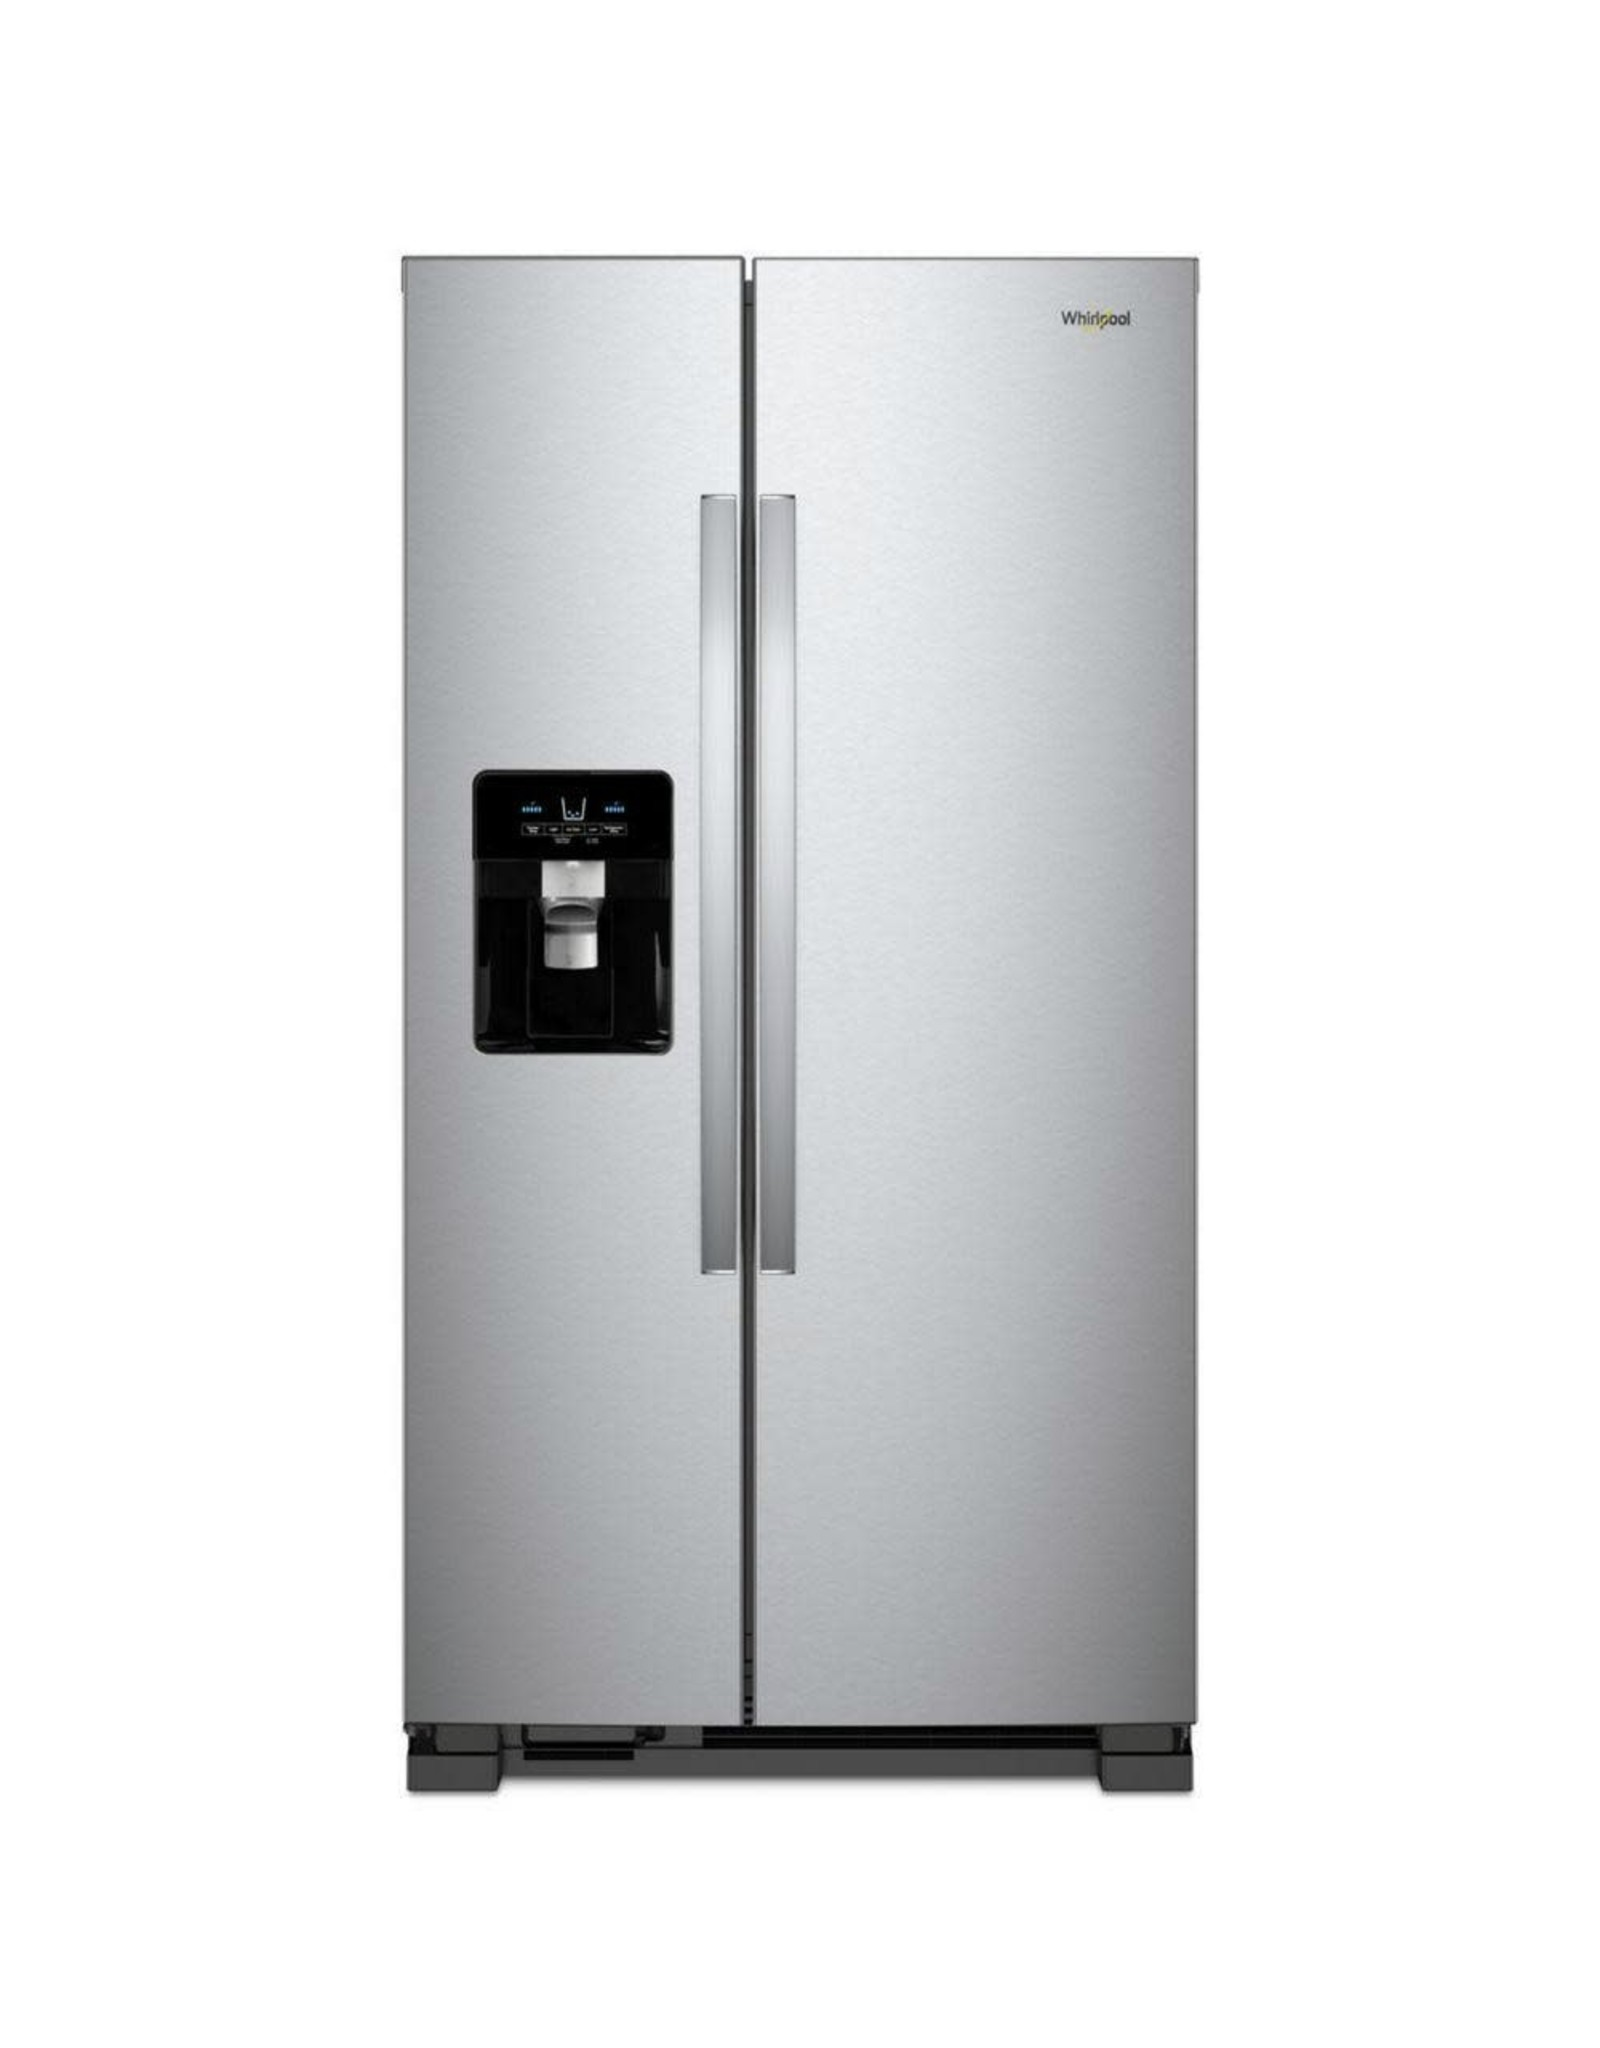 WHIRLPOOL 25 cu. ft. Side by Side Refrigerator in Fingerprint Resistant Stainless Steel